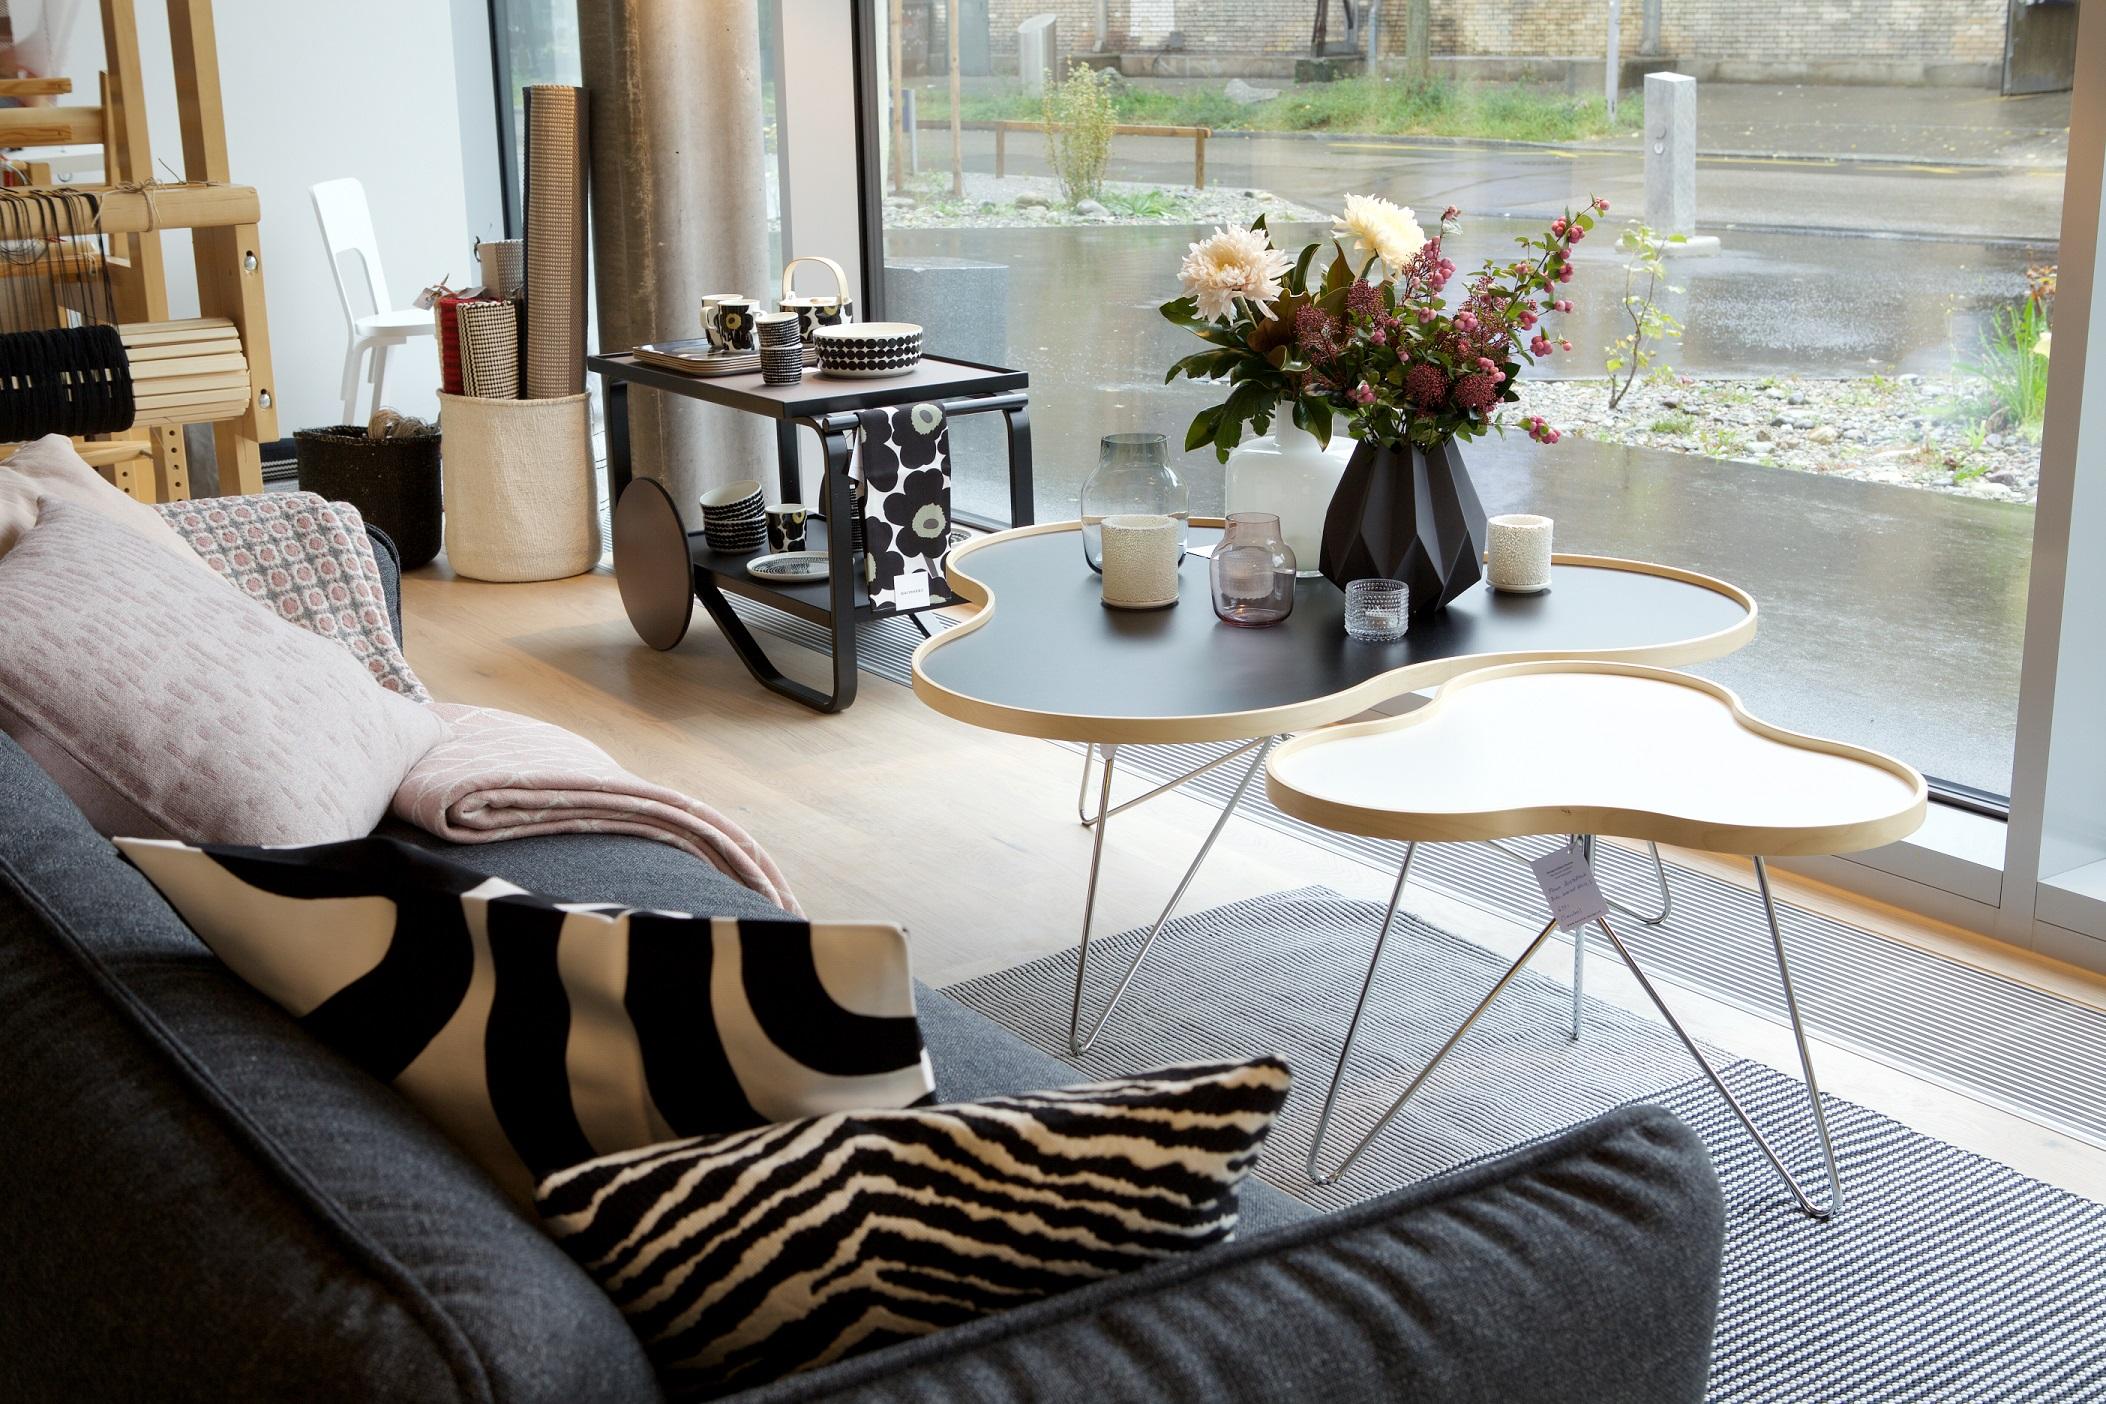 Helsinki Design Shop Eröffnung Im Zürcher Kreis 5 Proudmagcom